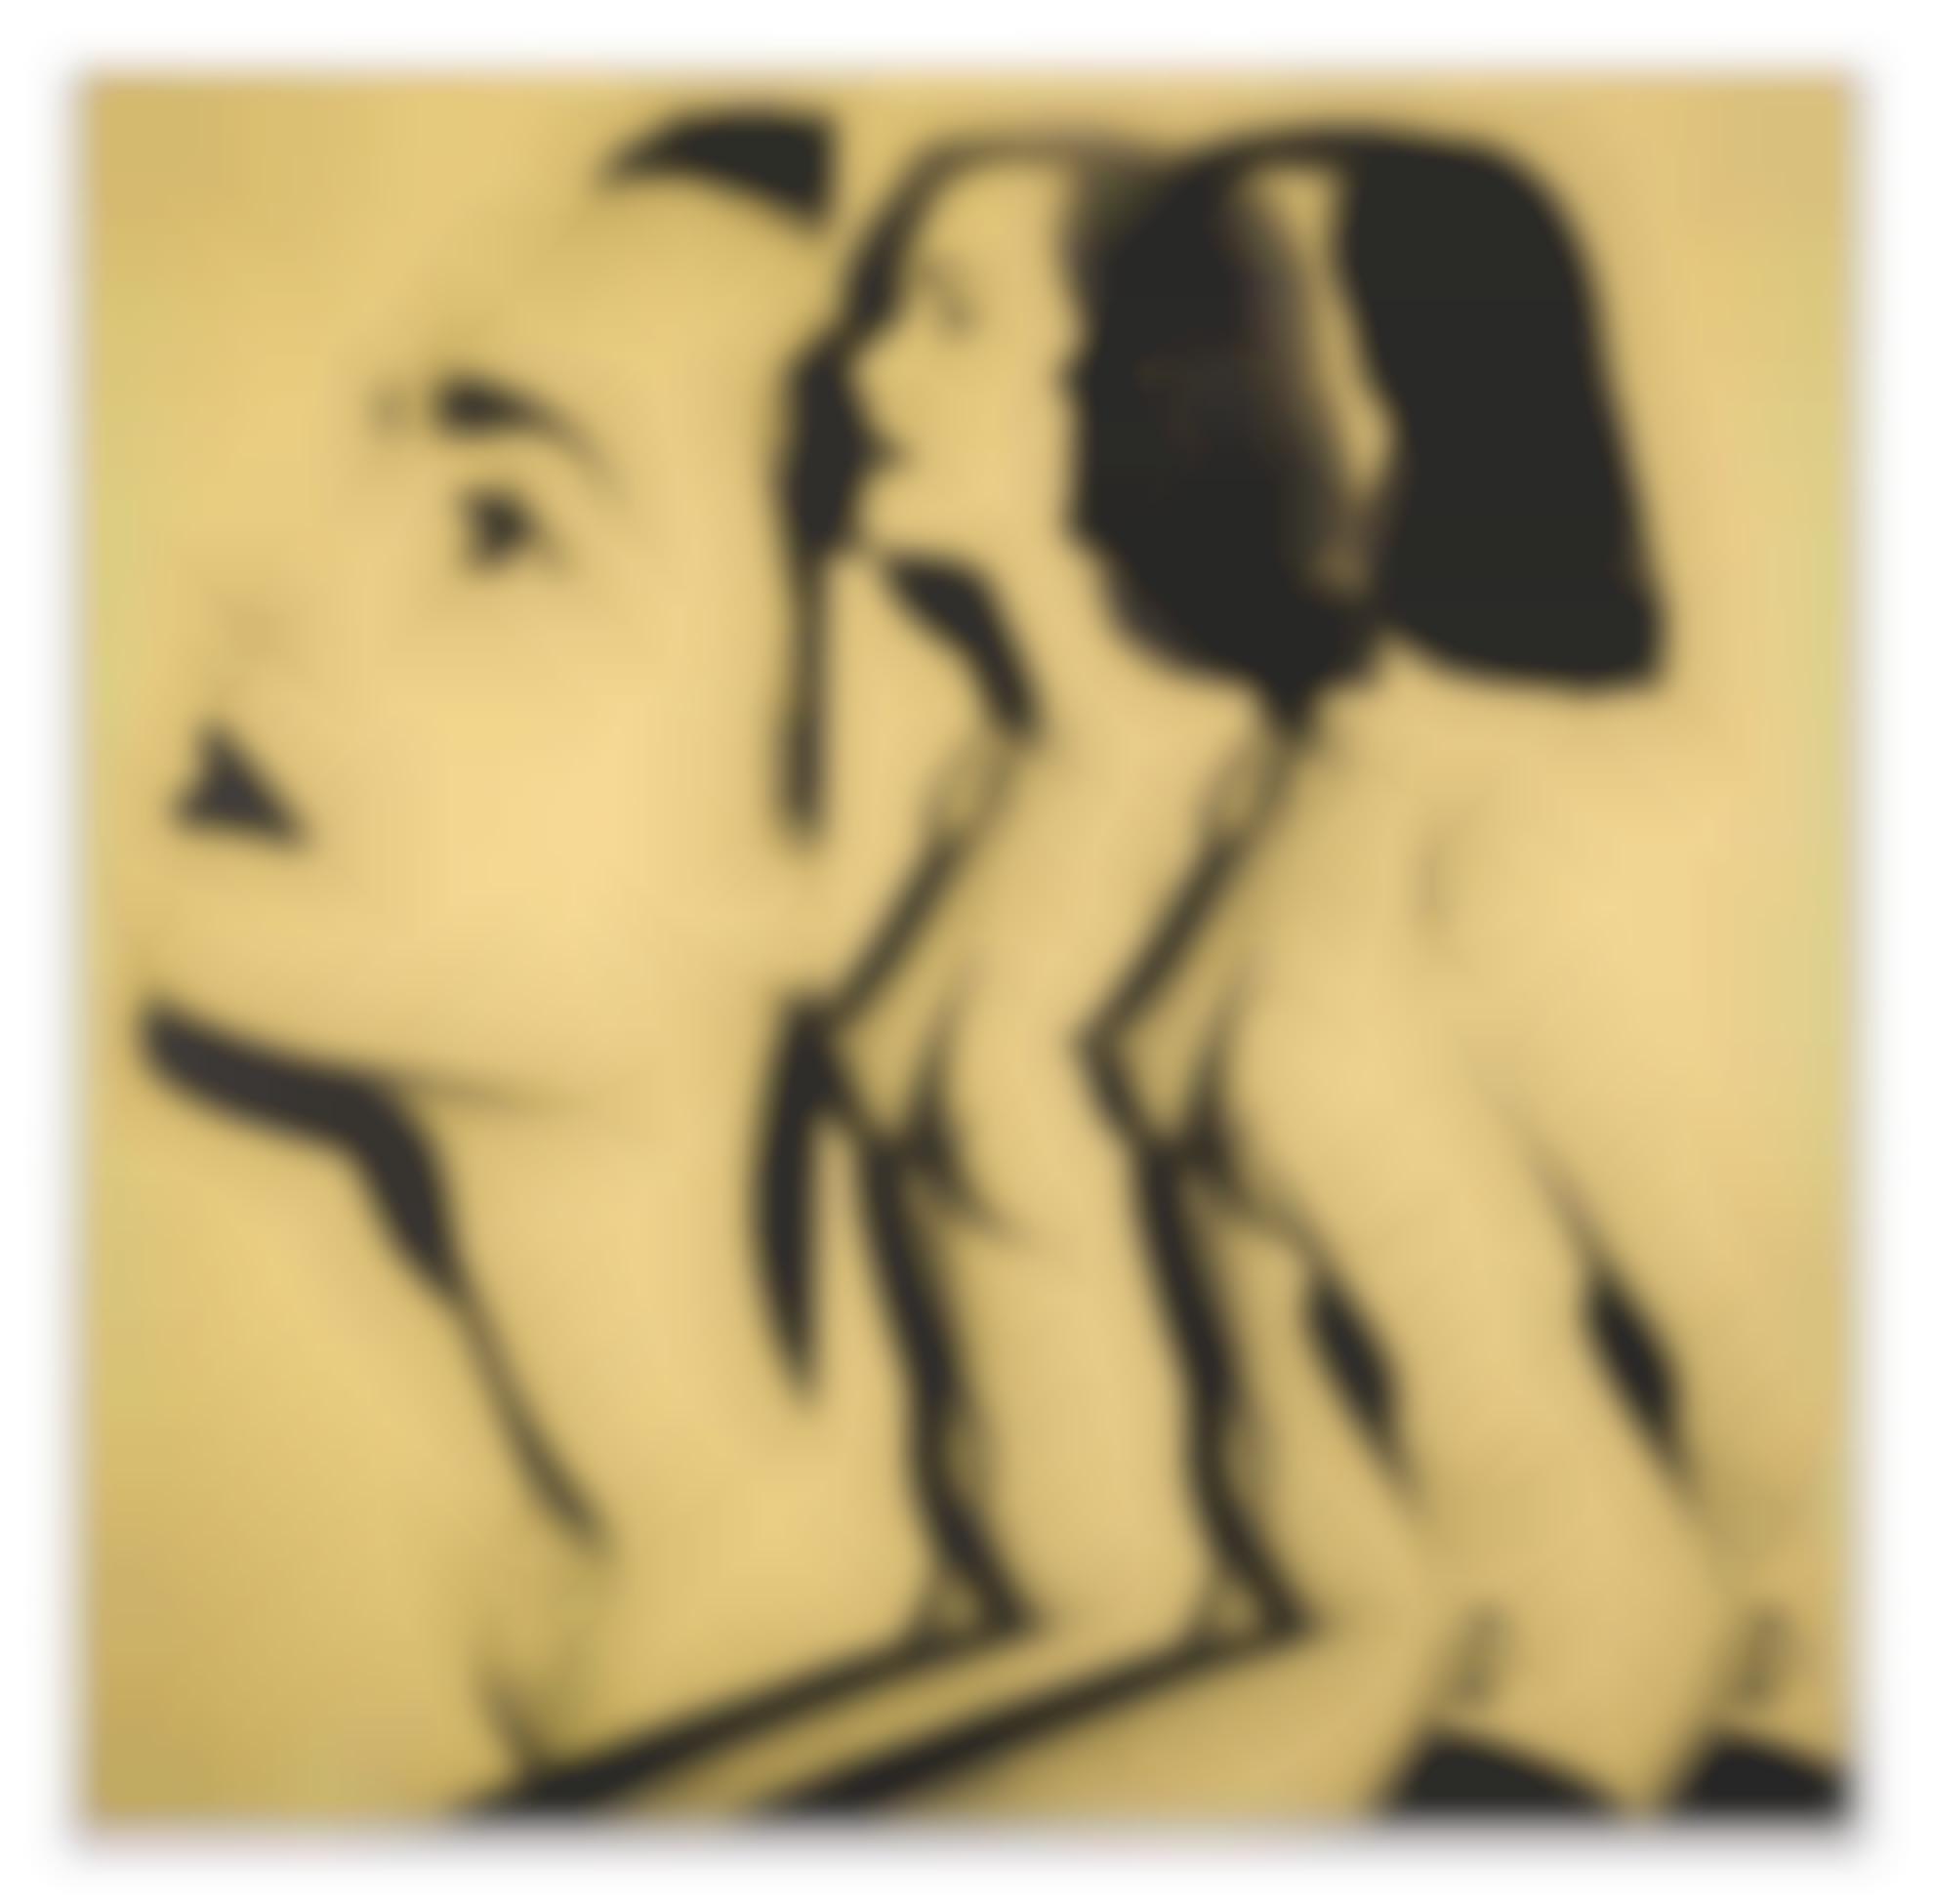 Andy Warhol-Pat Hearn-1985